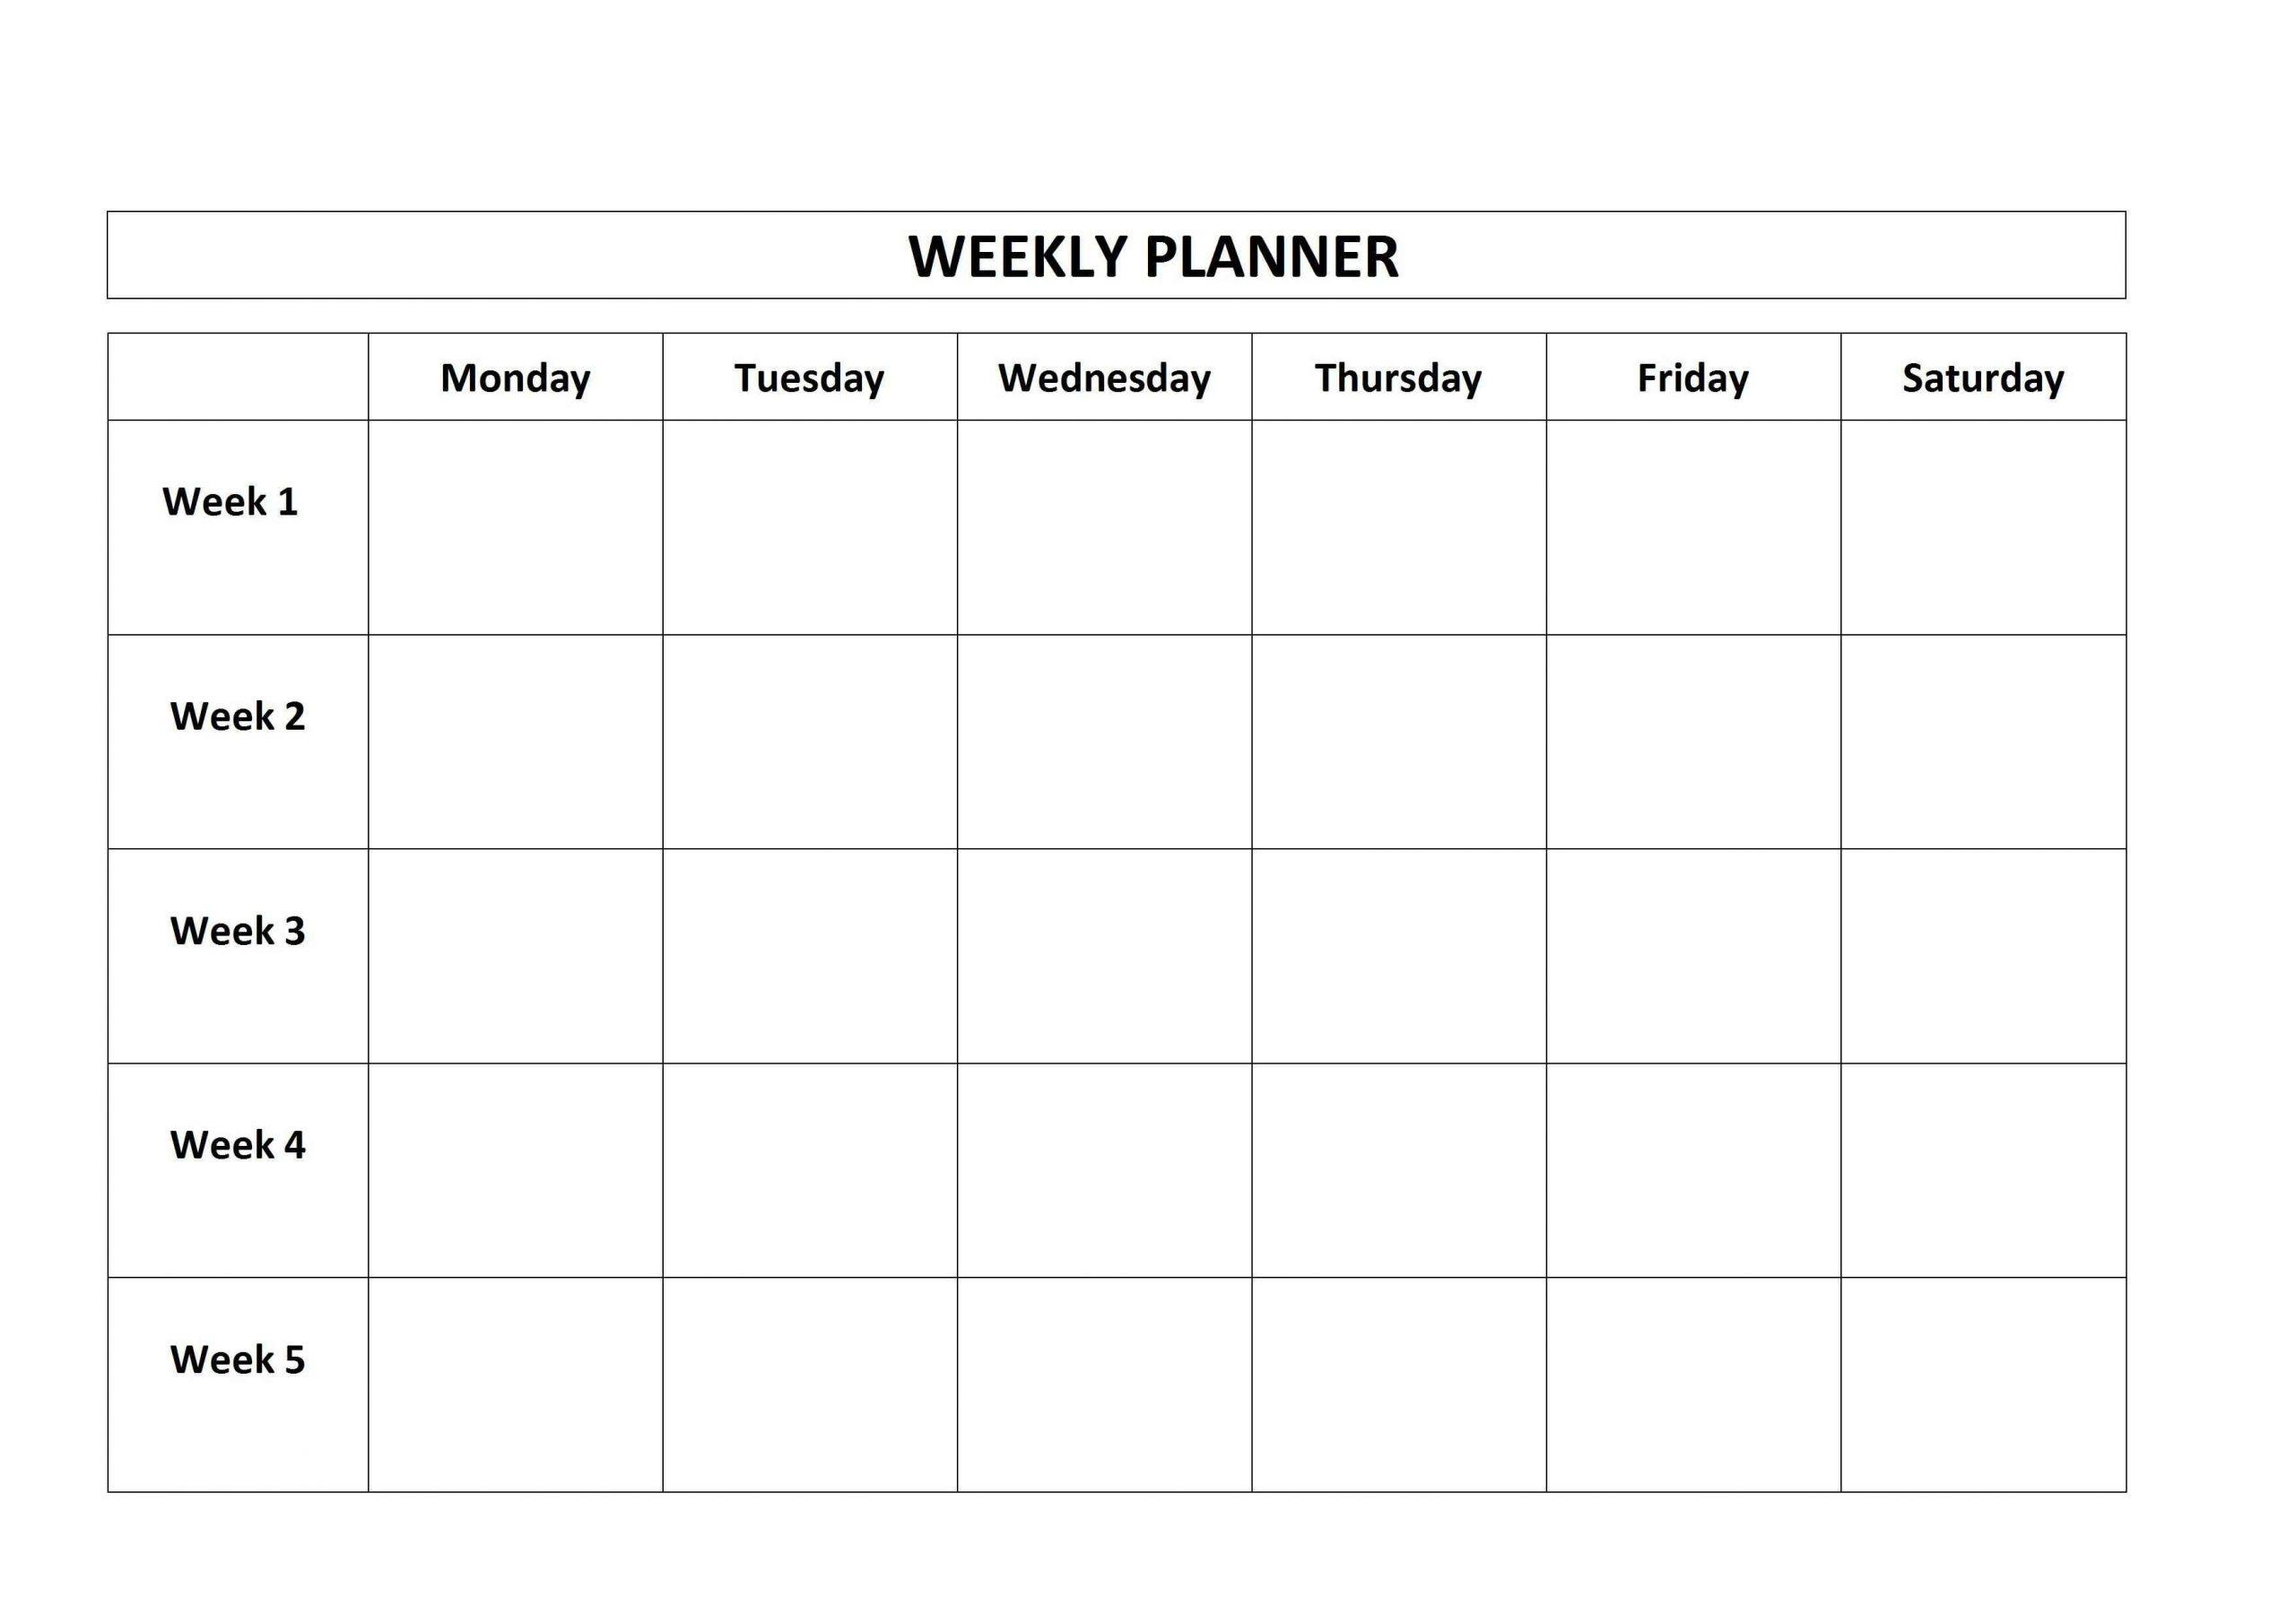 Monday To Friday Schedule Template | Example Calendar Monday Through Friday Calendar Monthly